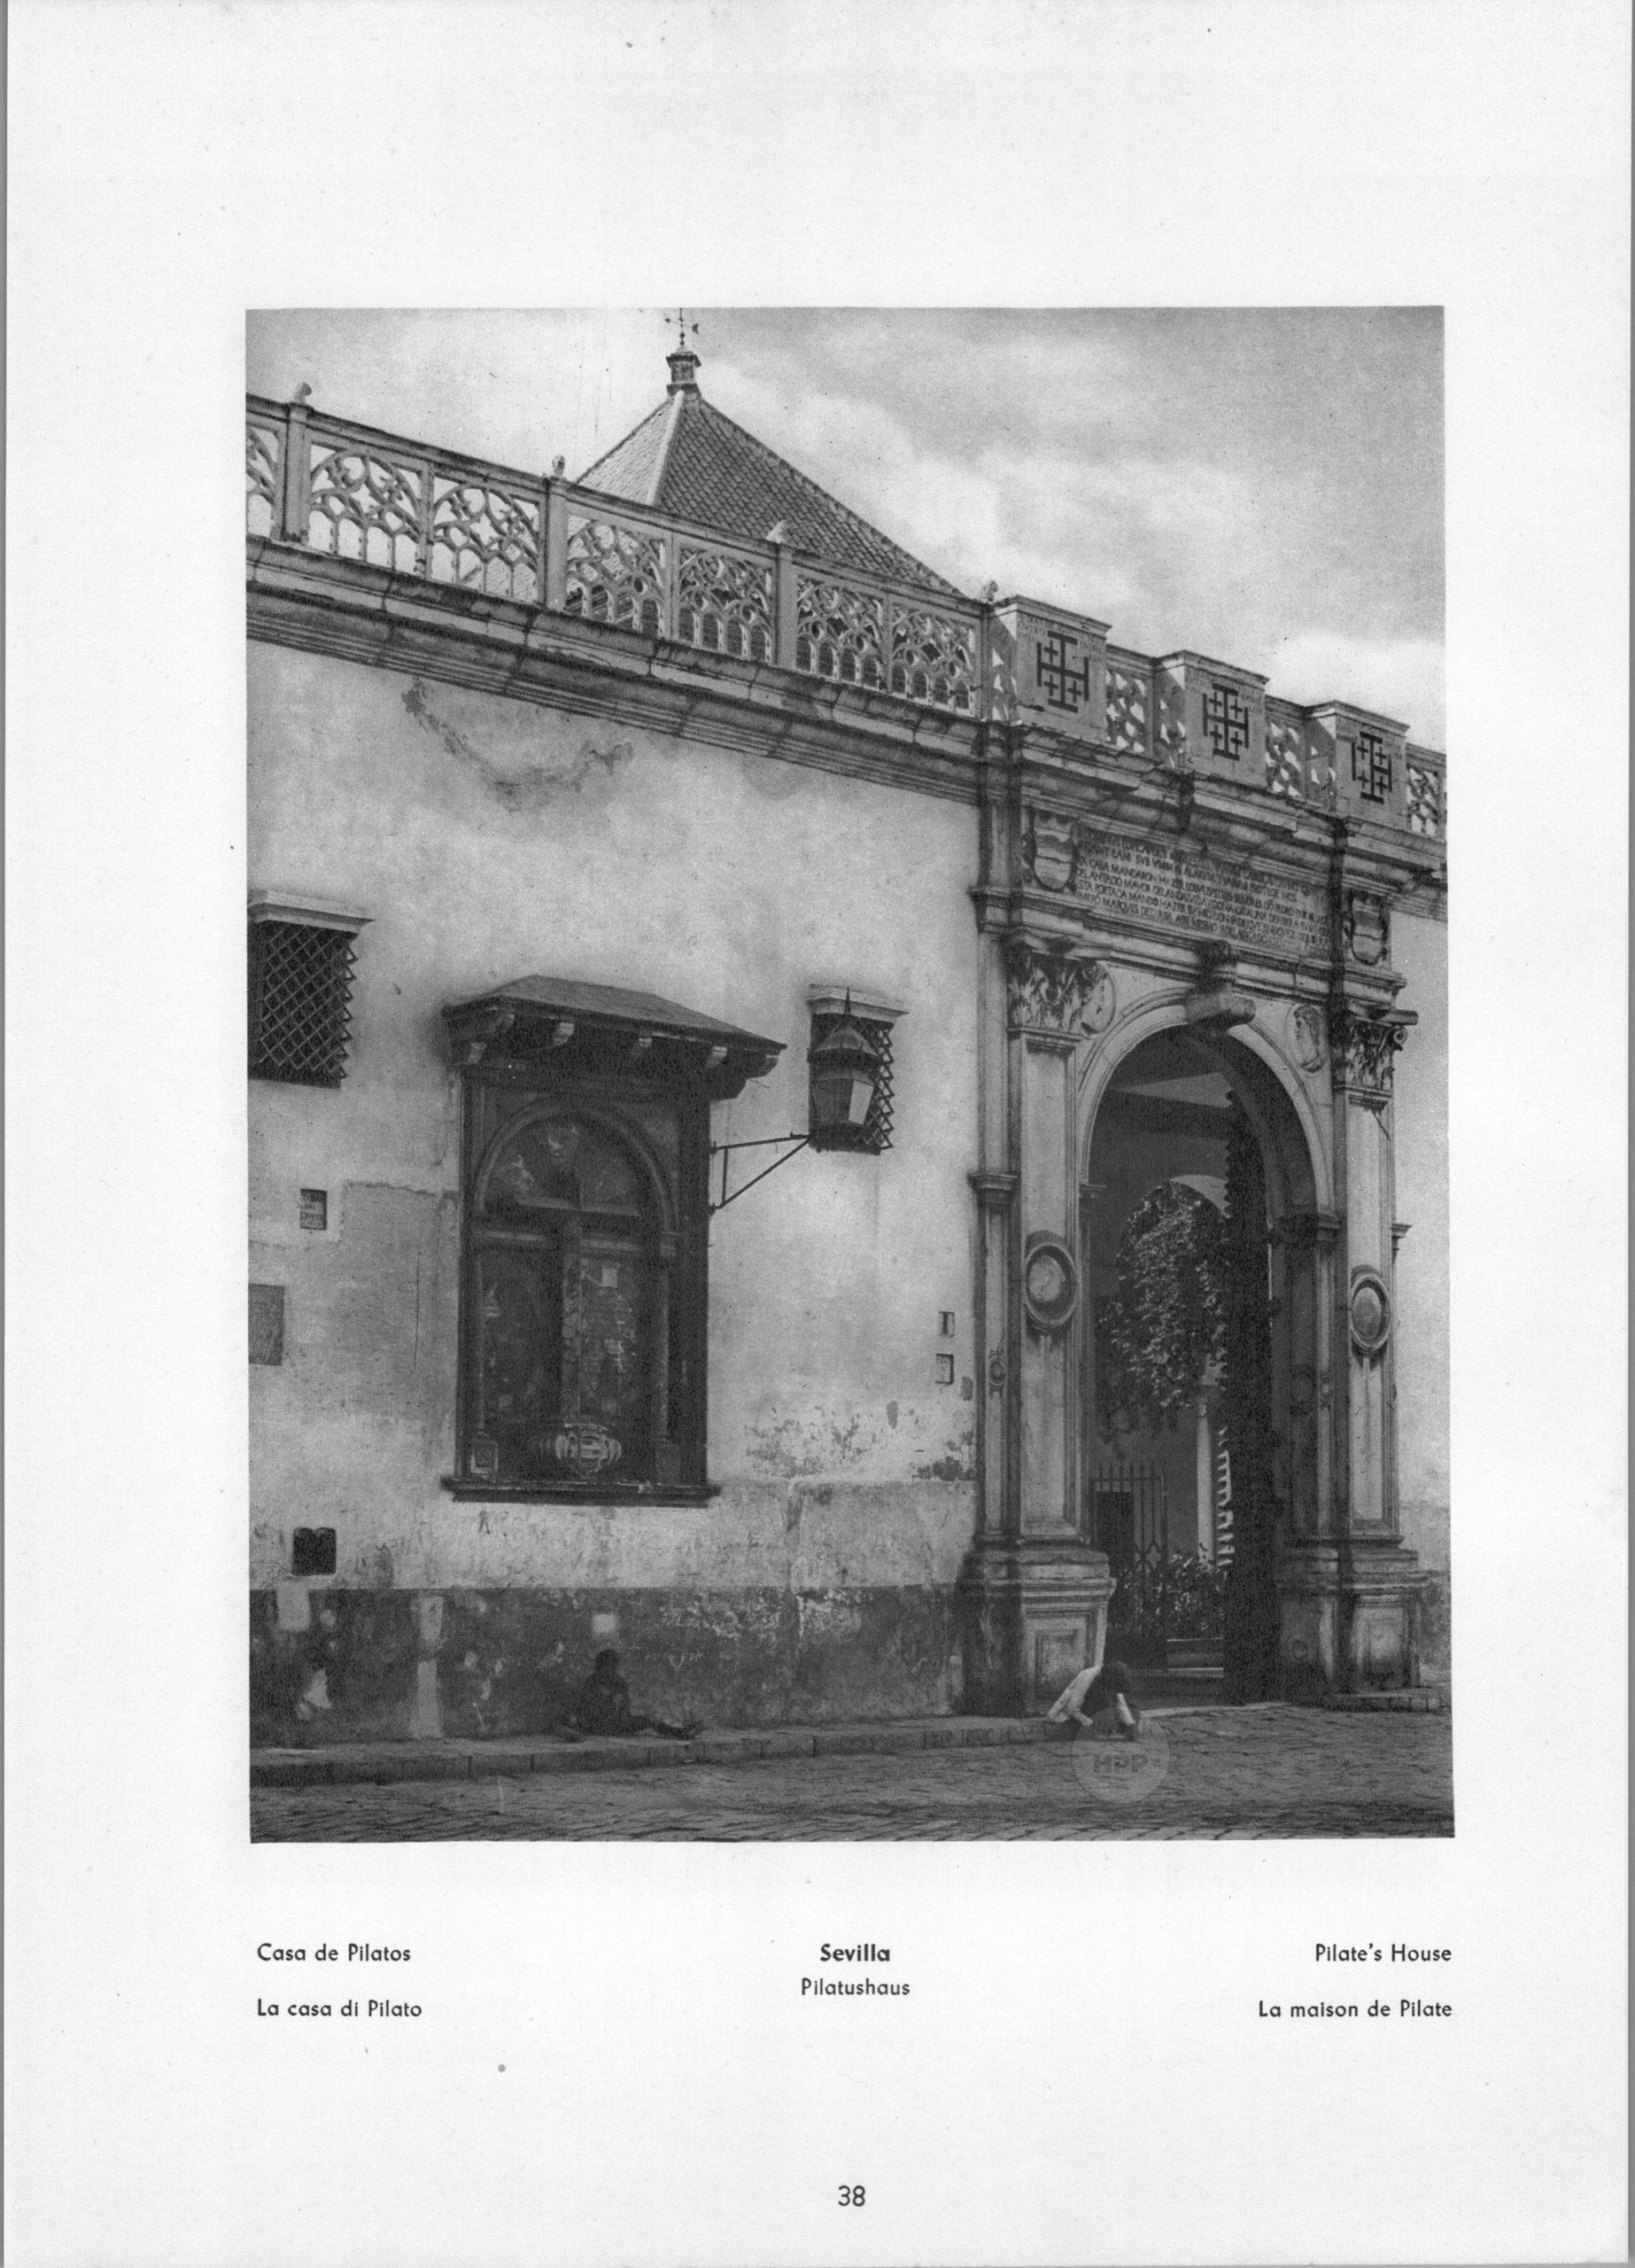 Sevilla - Pilate's House